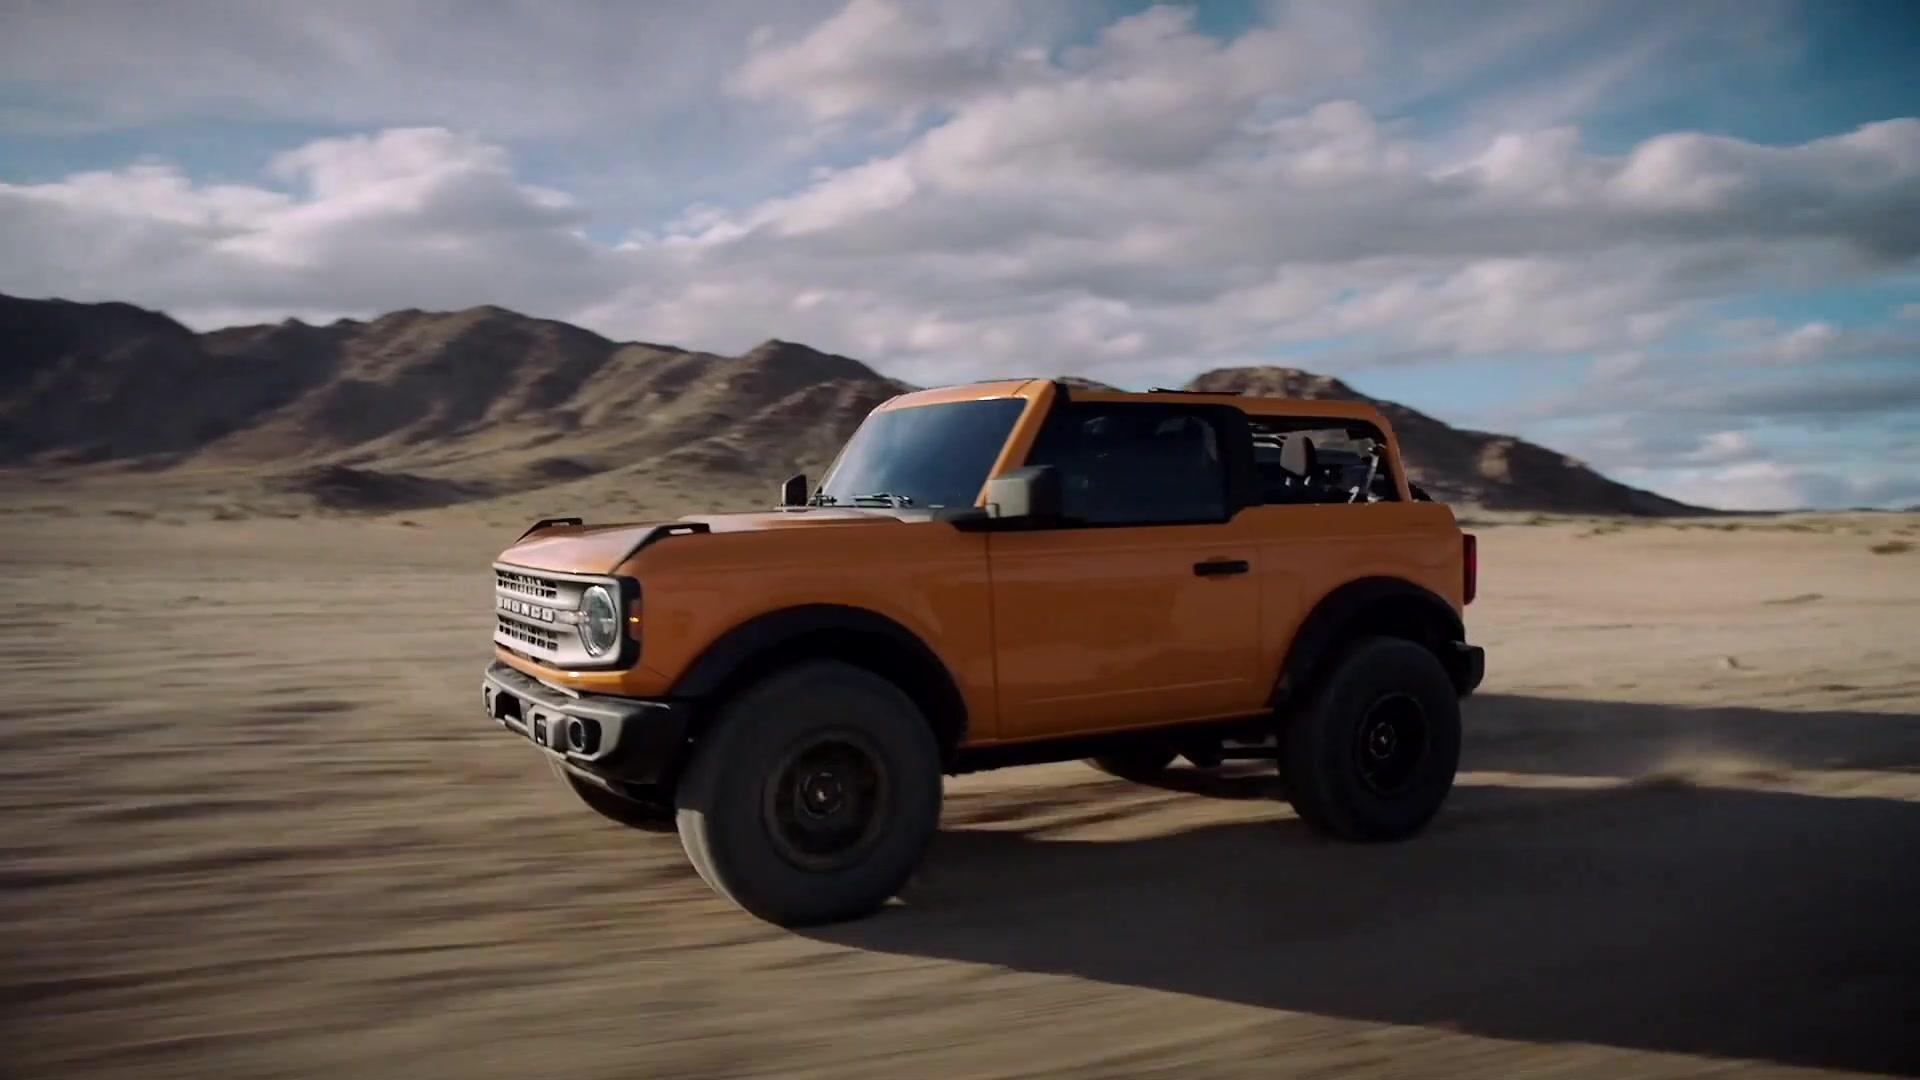 2021 Ford Bronco two door and four door Driving Video